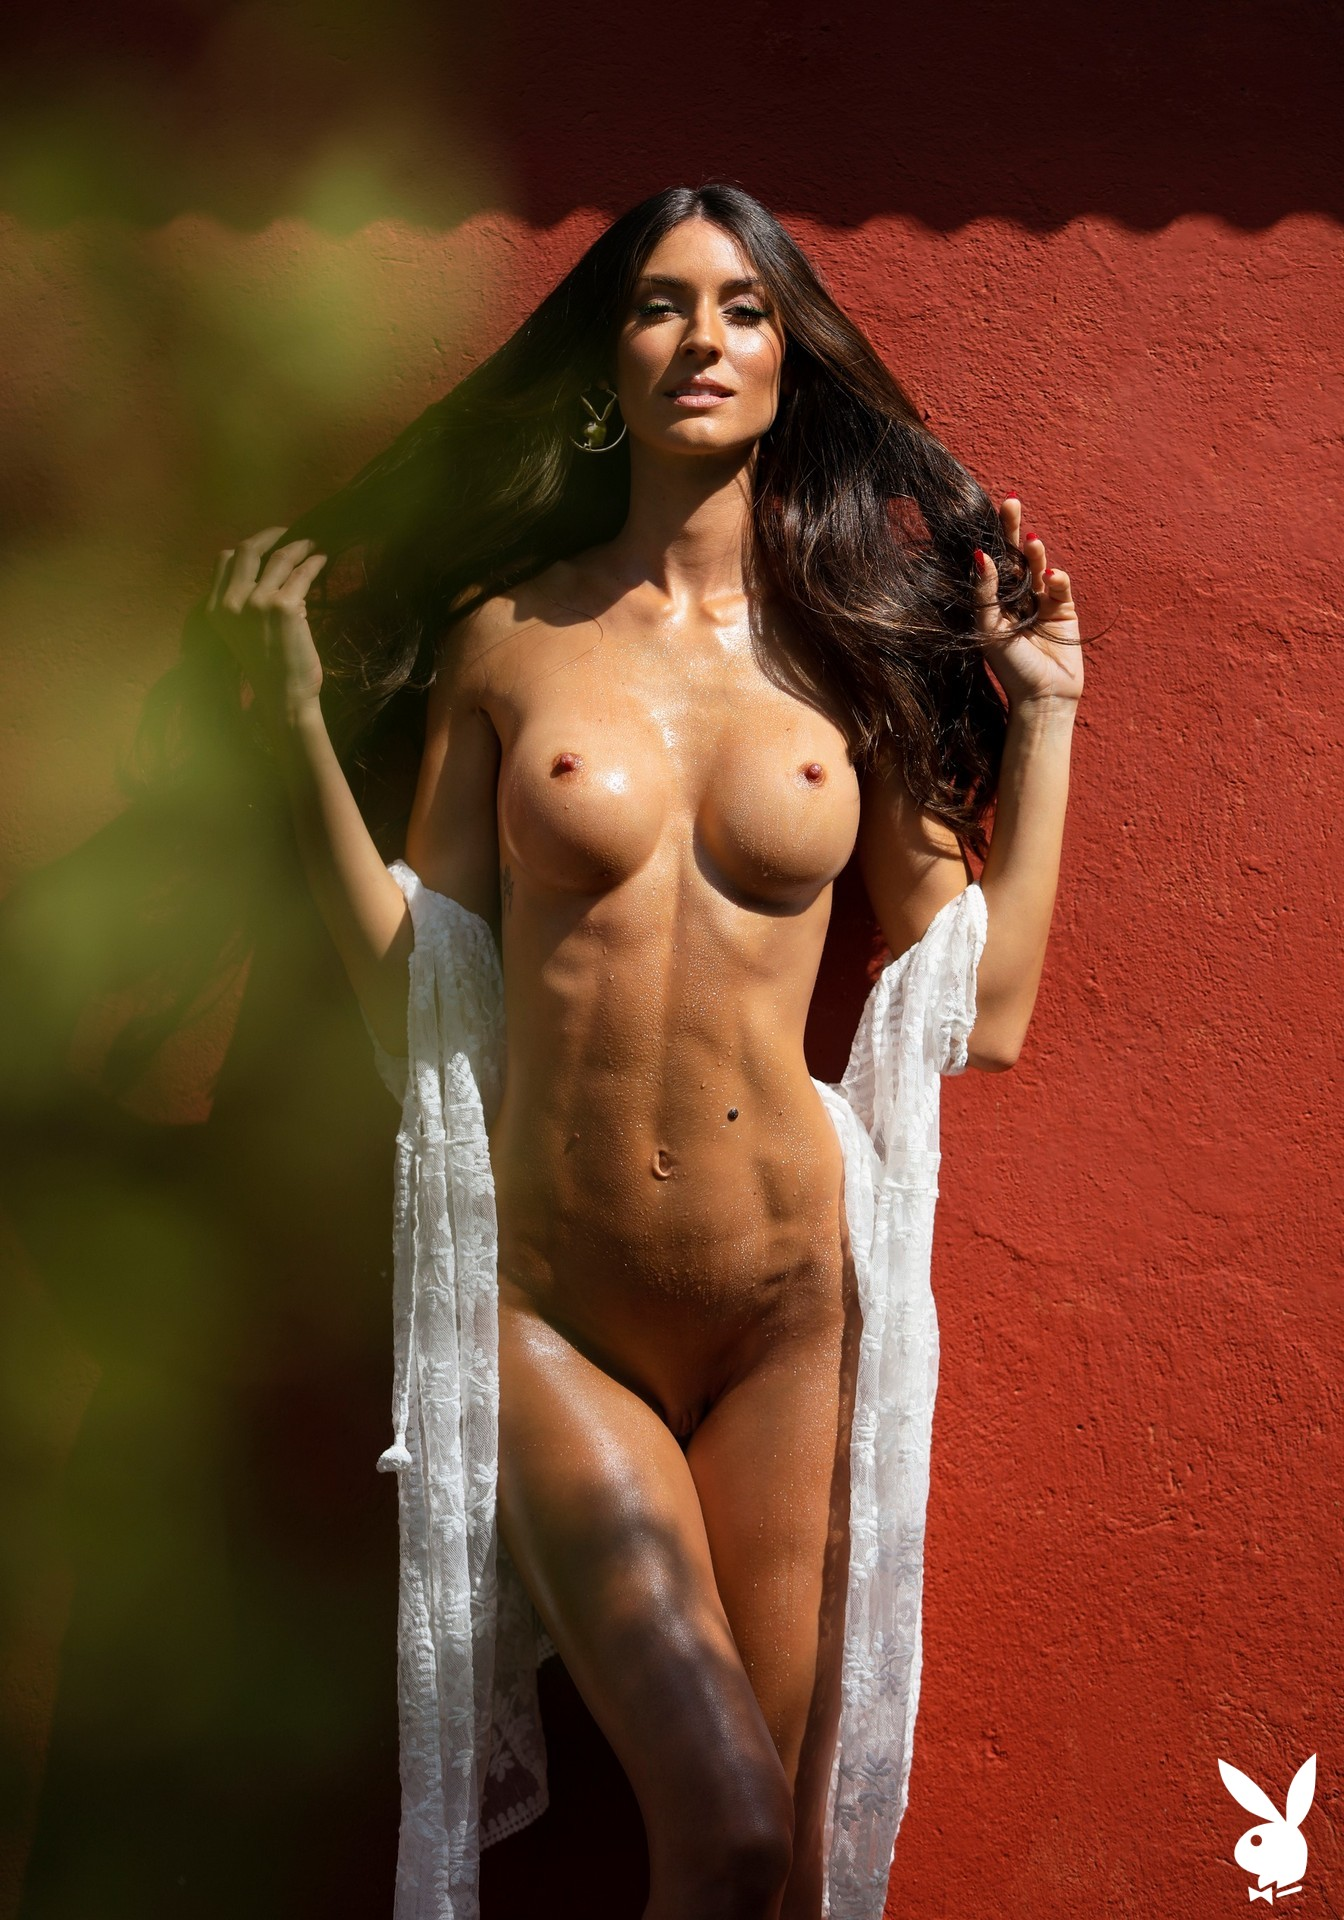 Zurine Aspiunza In Playboy International Playboy Plus (1)